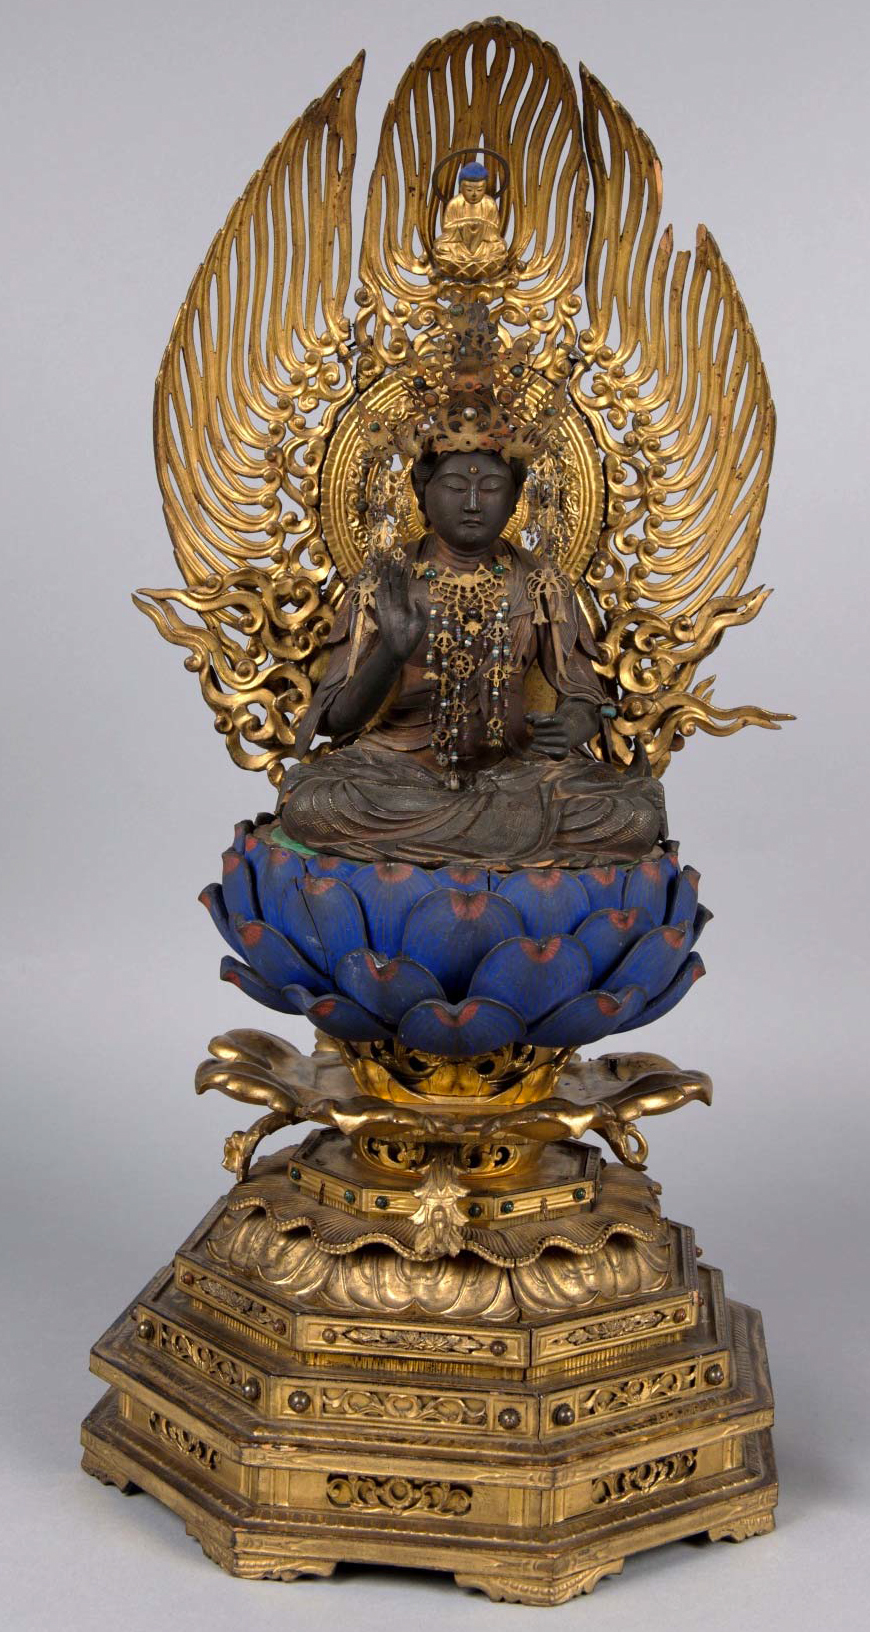 Japanese Buddhist Temple Statuette - Longfellow House Washington's